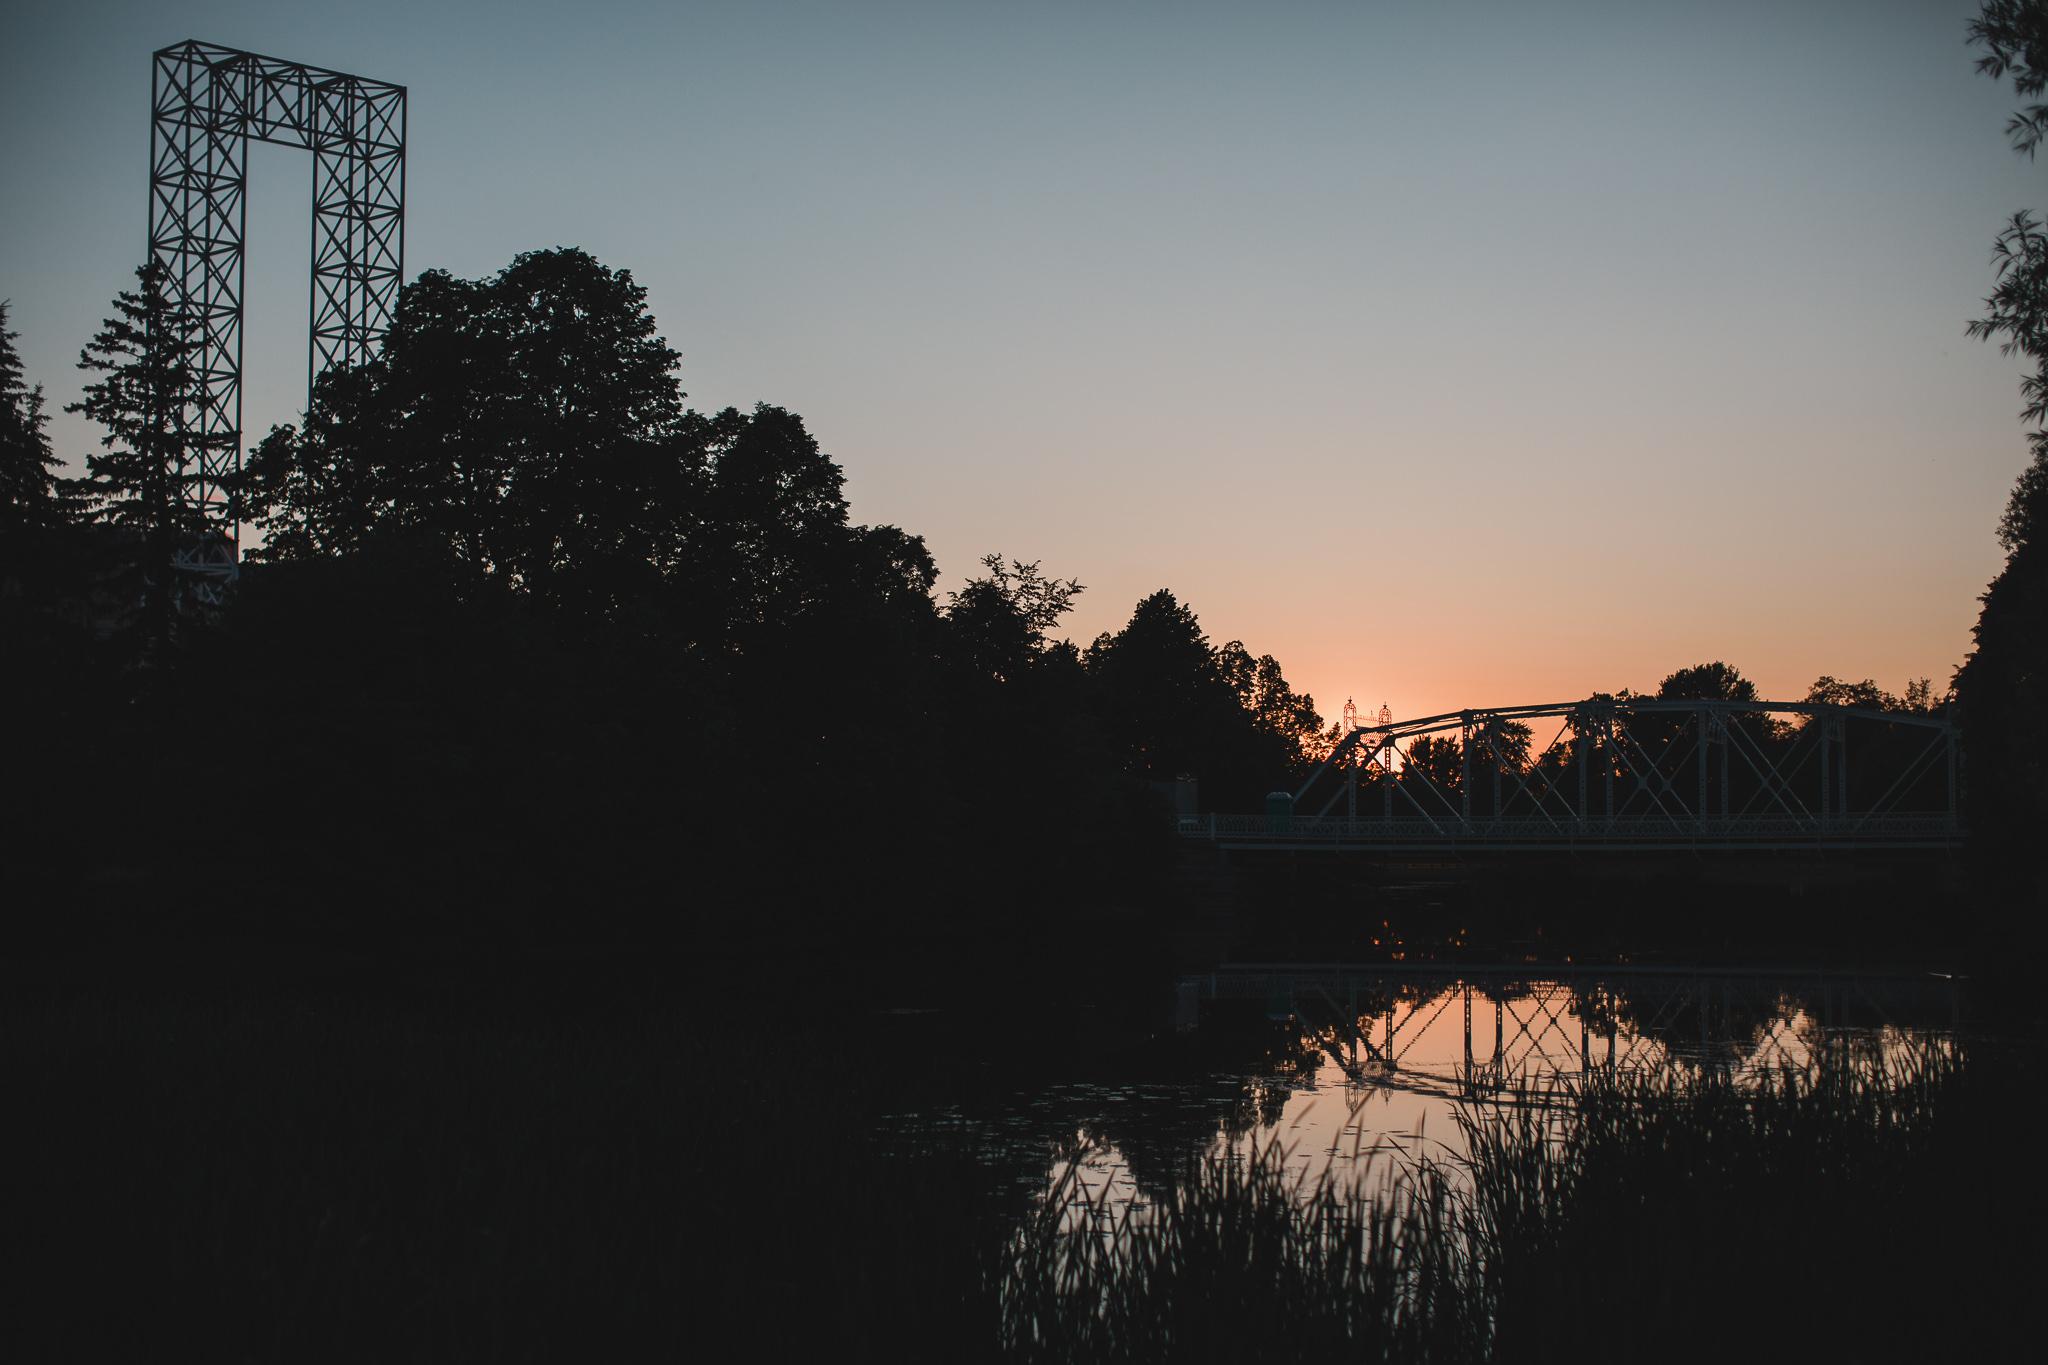 New Edinburgh Park, Ottawa at Sunset